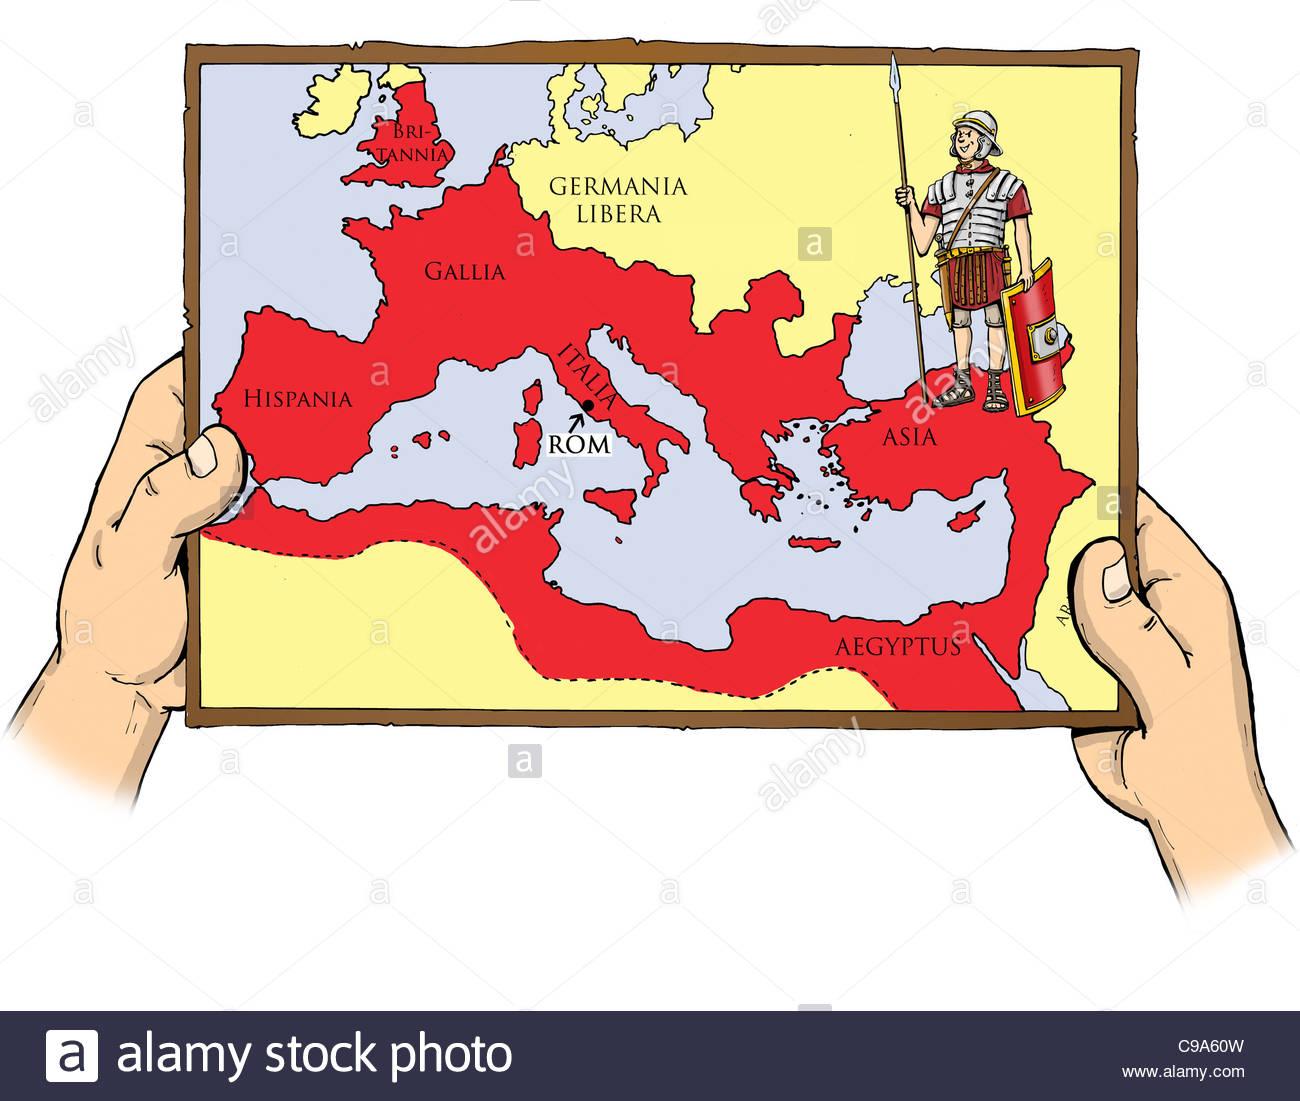 rome map stockfotos rome map bilder alamy. Black Bedroom Furniture Sets. Home Design Ideas